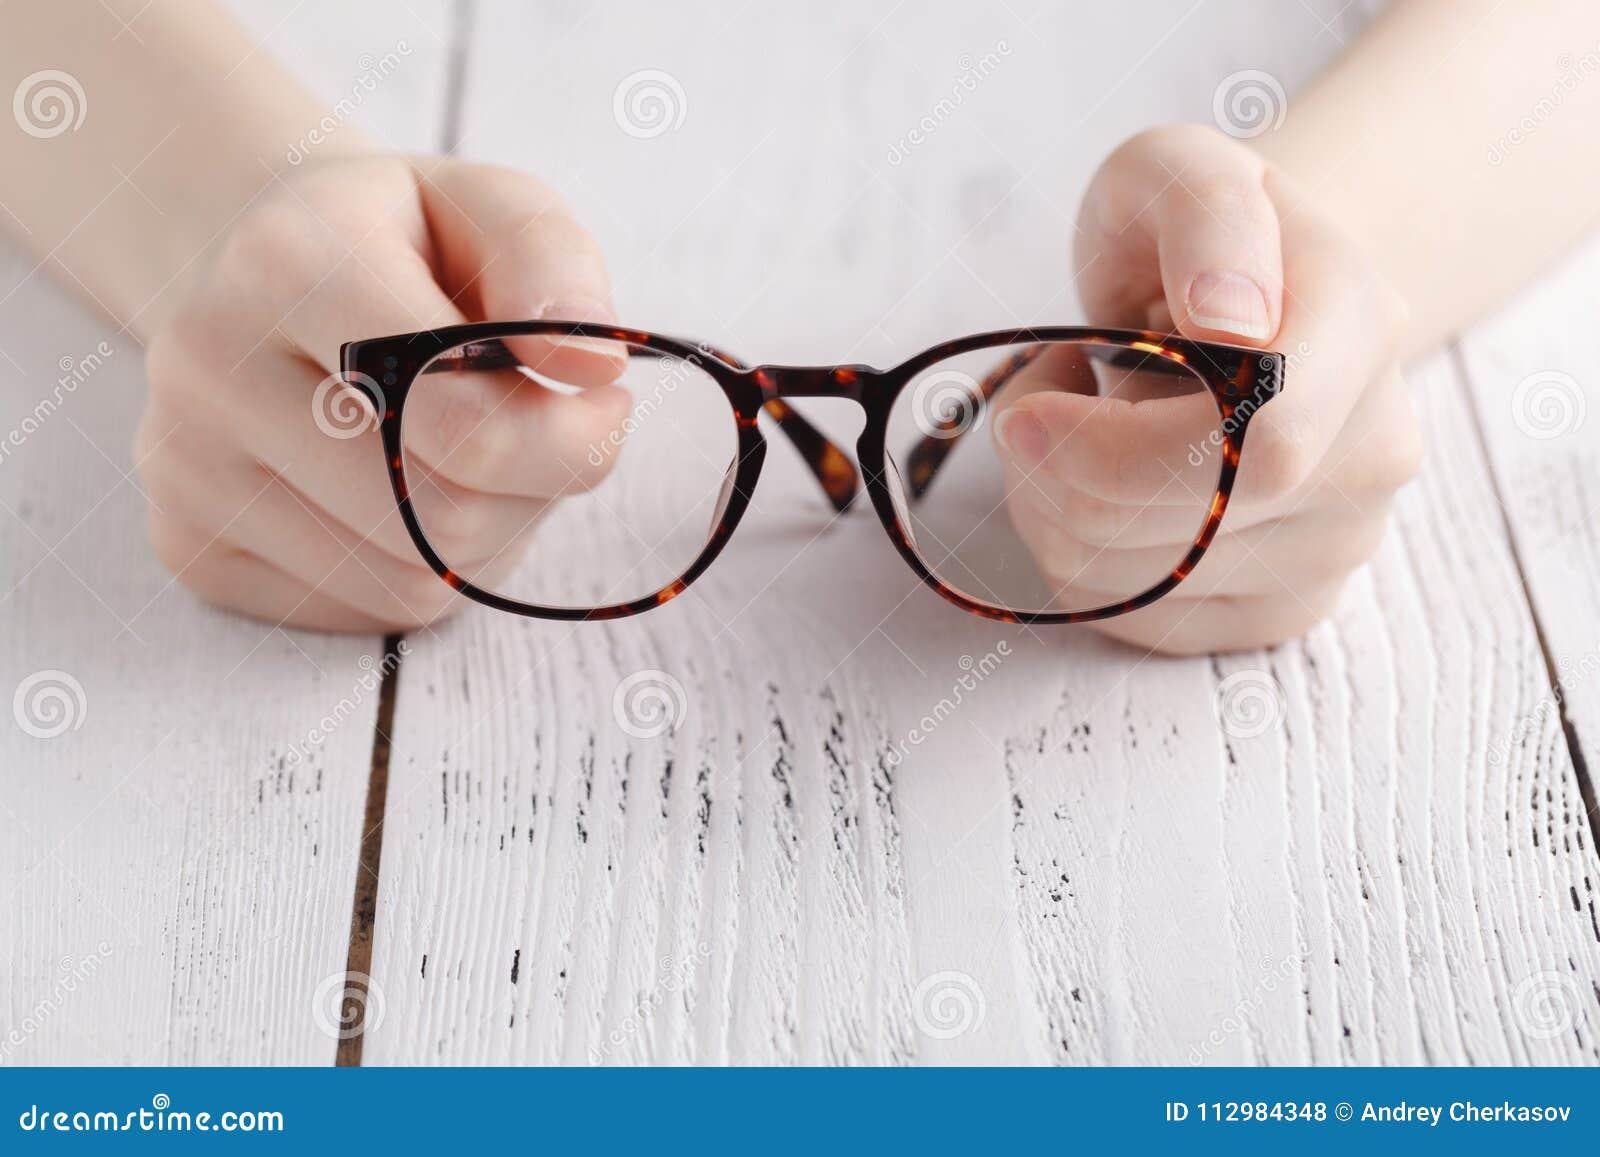 Holding glasses in female hands